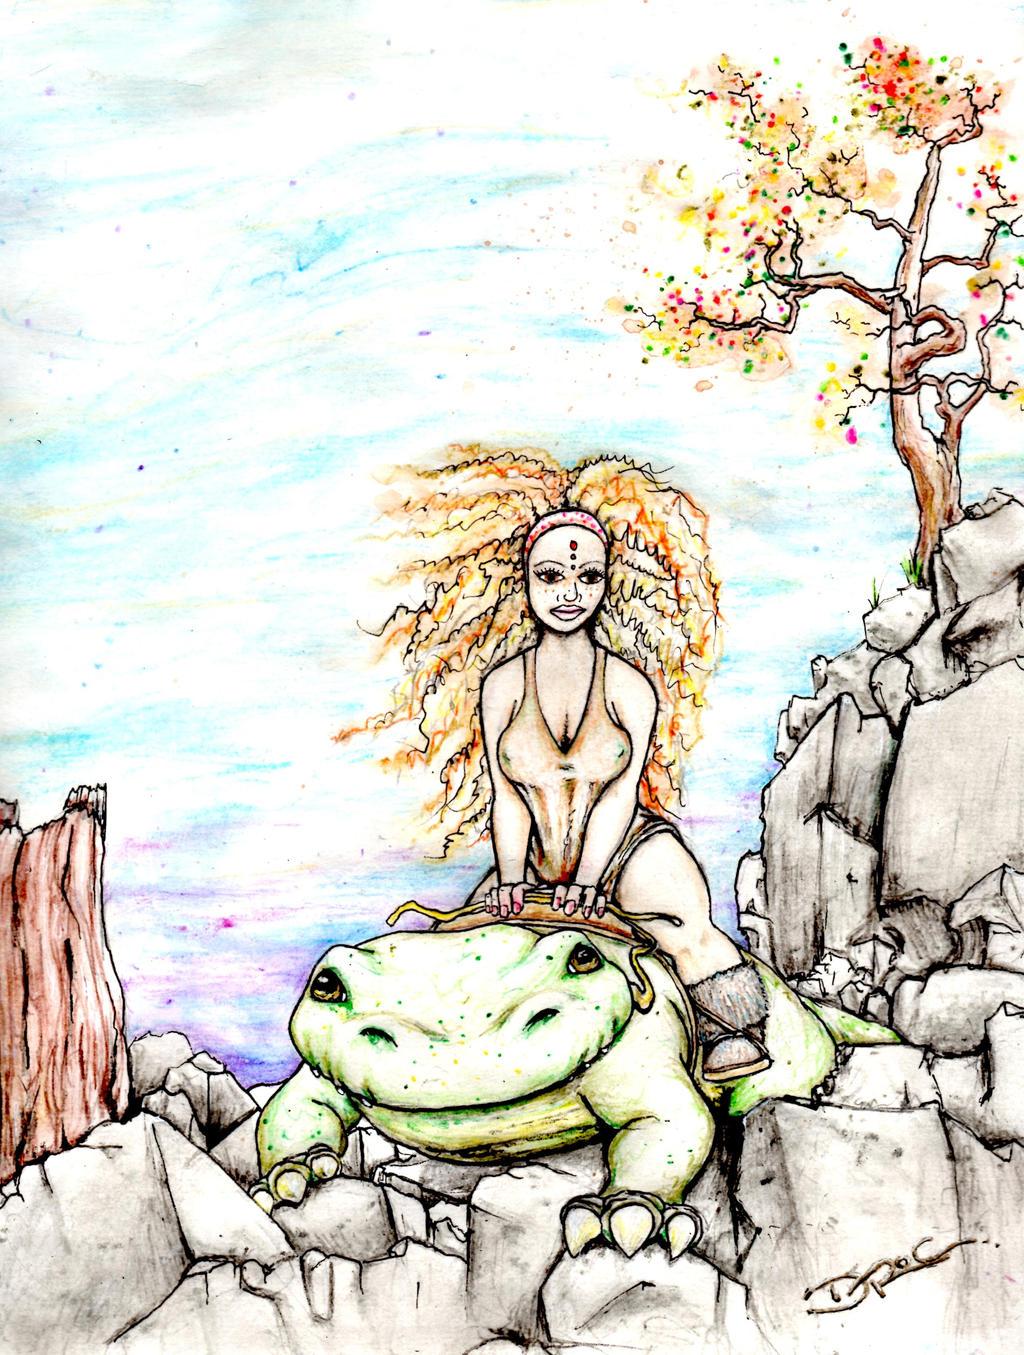 riding the krokopona by DrocMacnamara